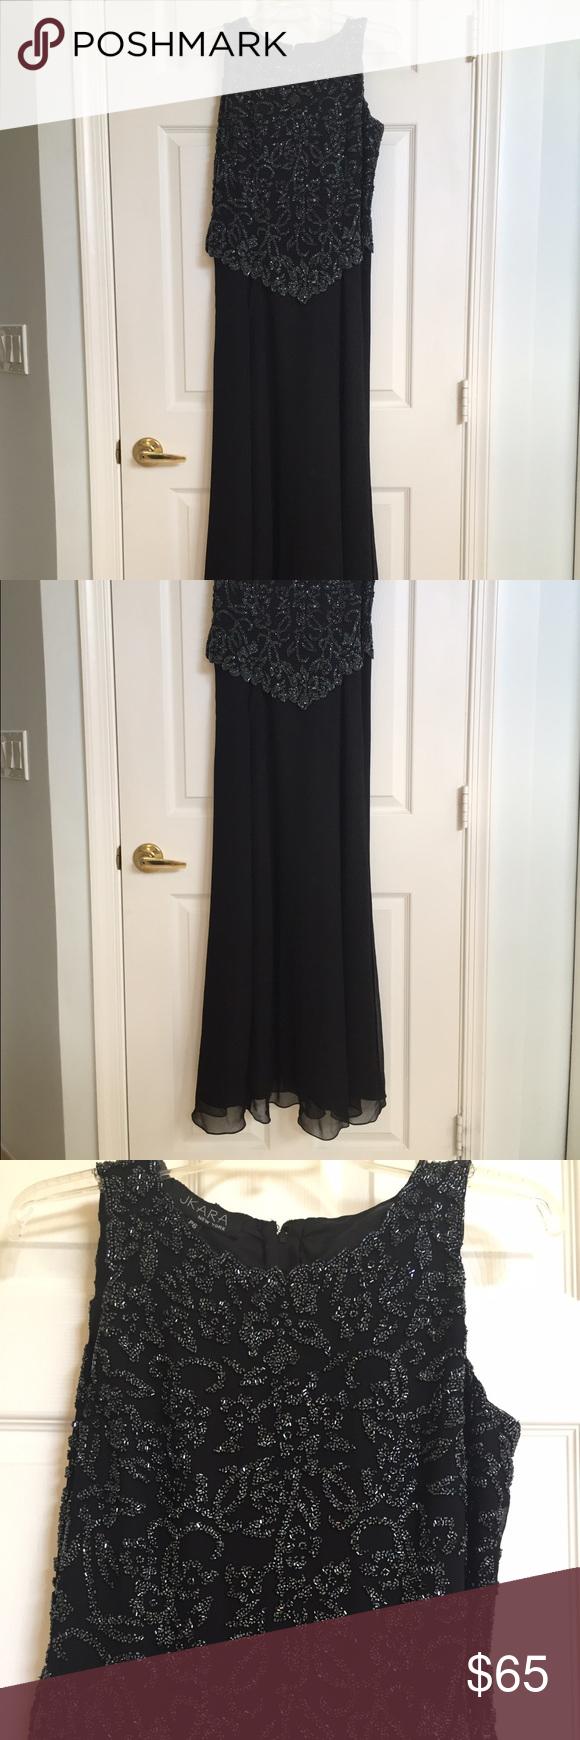 Jkara newyork sleeveless sequined dress sleeveless holidayparty